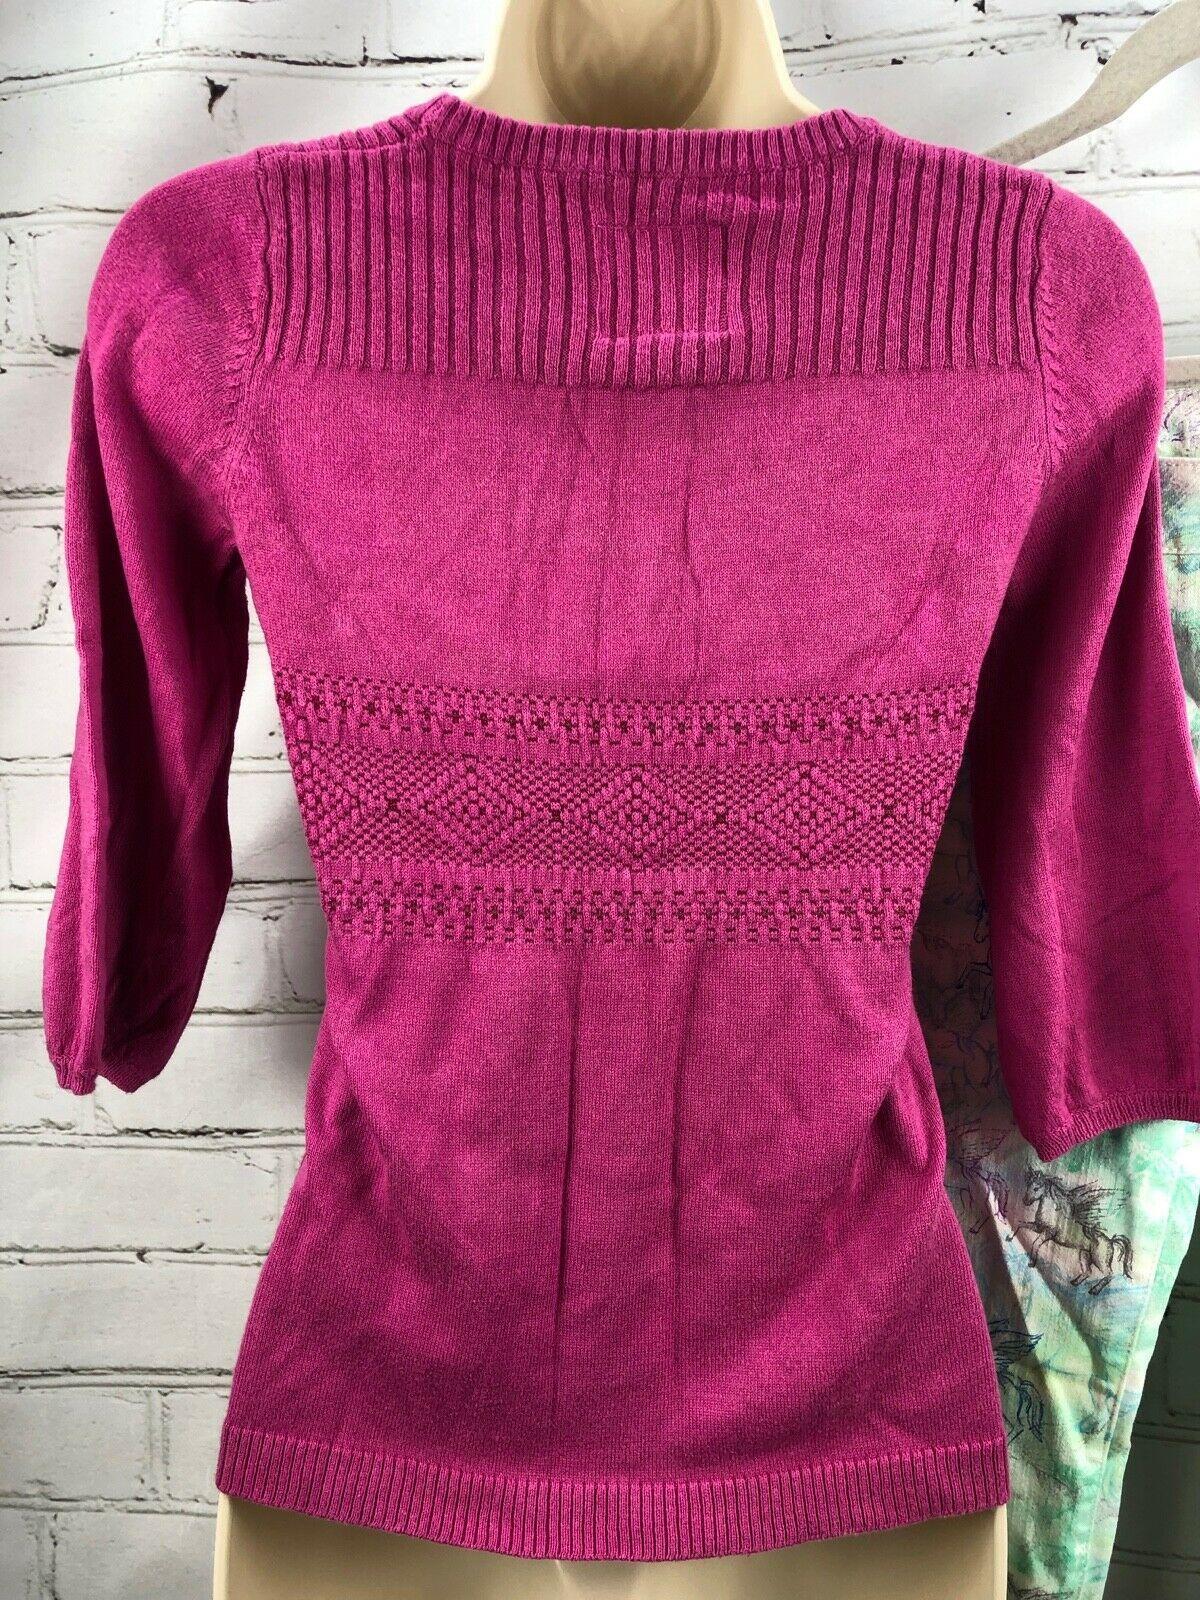 JUSTICE Lightweight Sweater Top + Unicorn Premium Jeans Size 12 Set Lot image 4